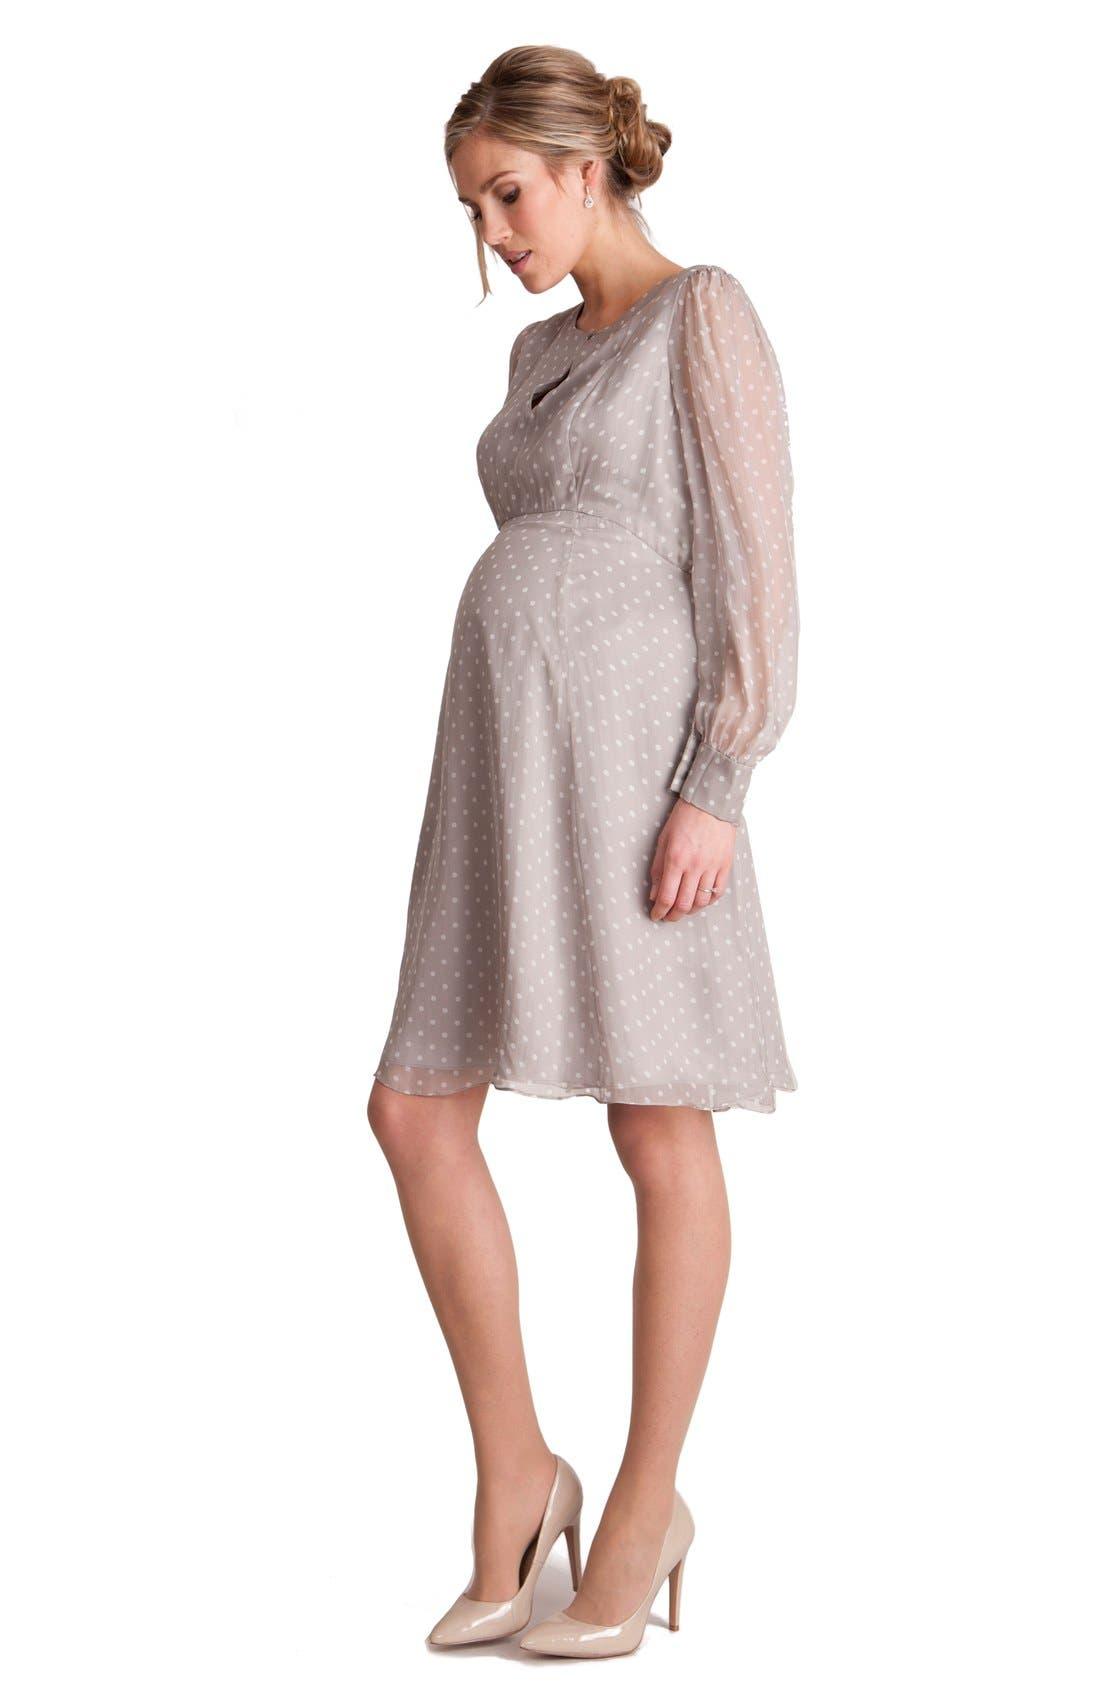 Alternate Image 1 Selected - Seraphine'EldoraLuxe' Maternity Dress